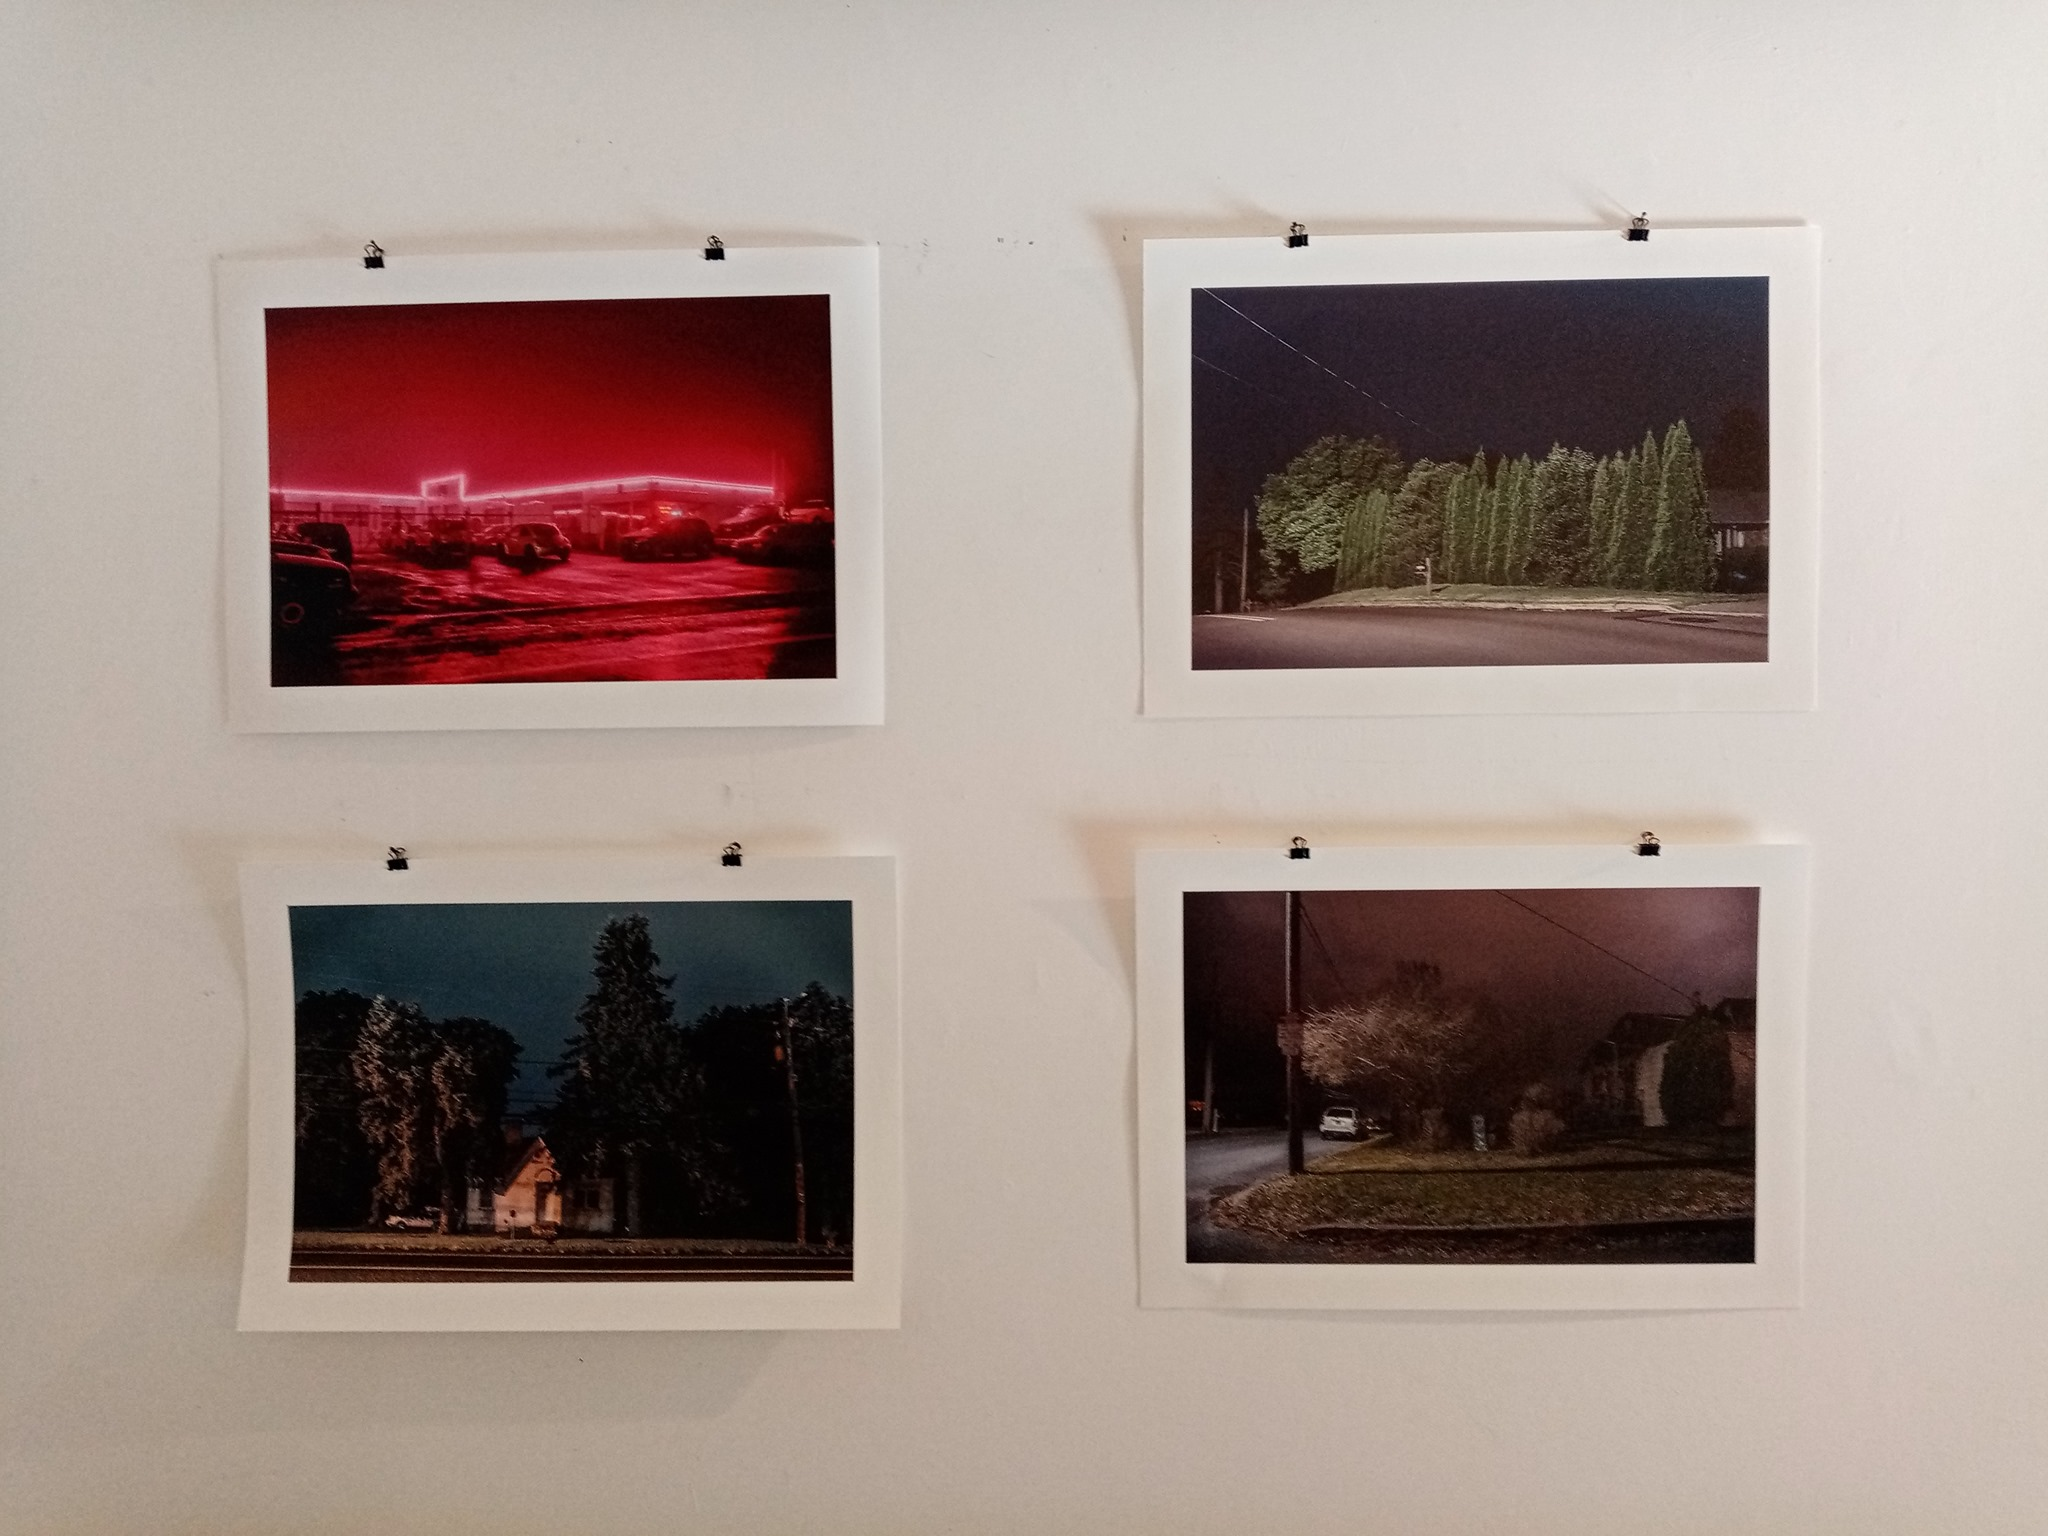 Peter Ydeen, Easton Nights, installation view